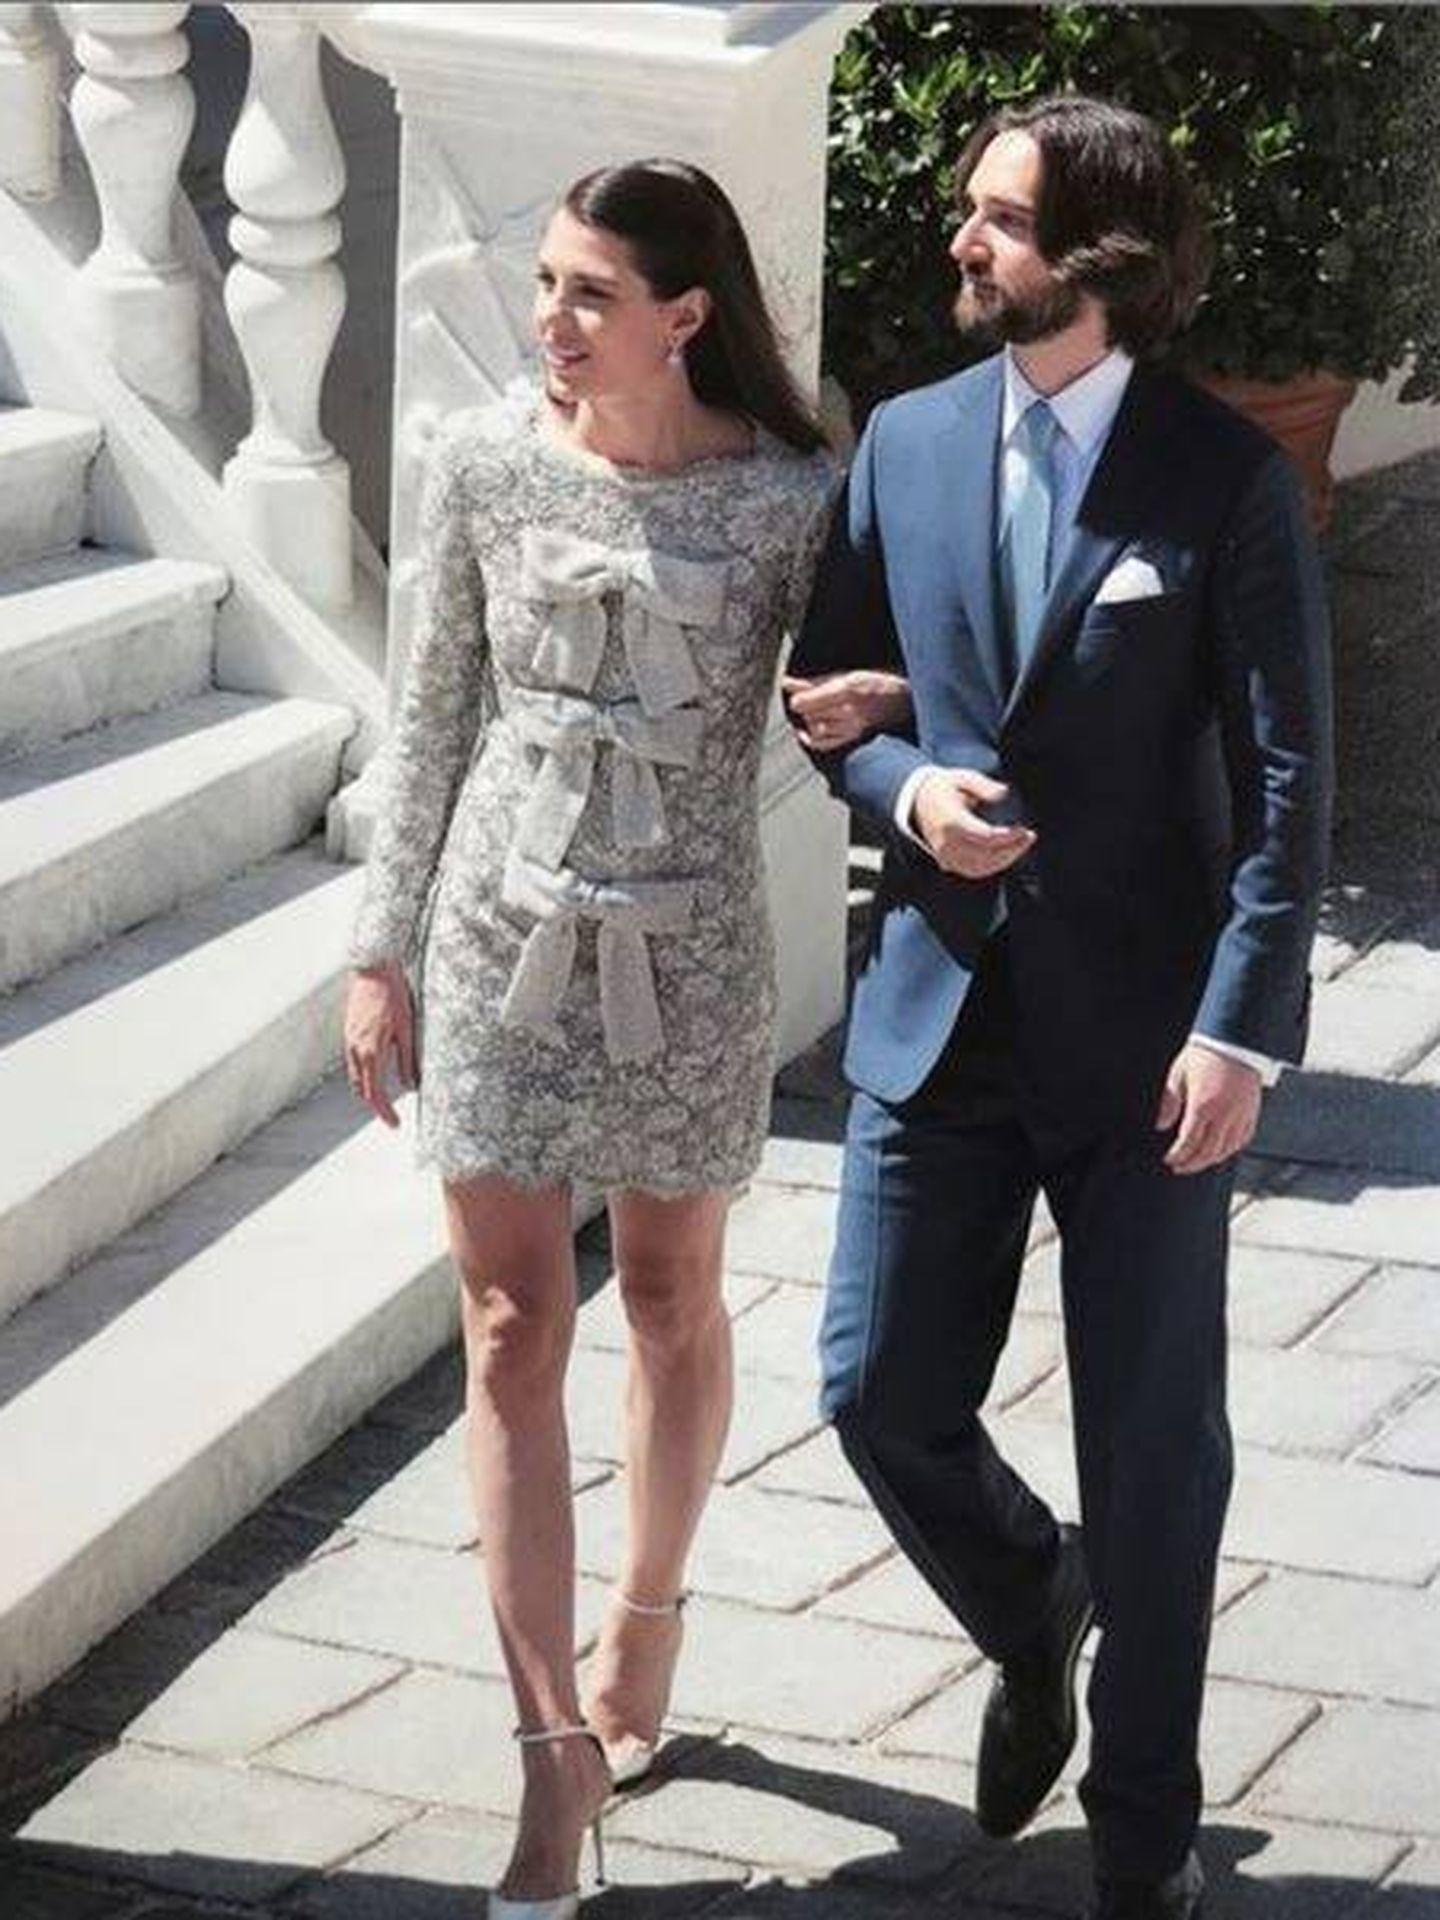 Foto oficial de la boda de Carlota Casiraghi y Dimitri Rassam. (Eric Mathon. Casa Principesca de Mónaco)